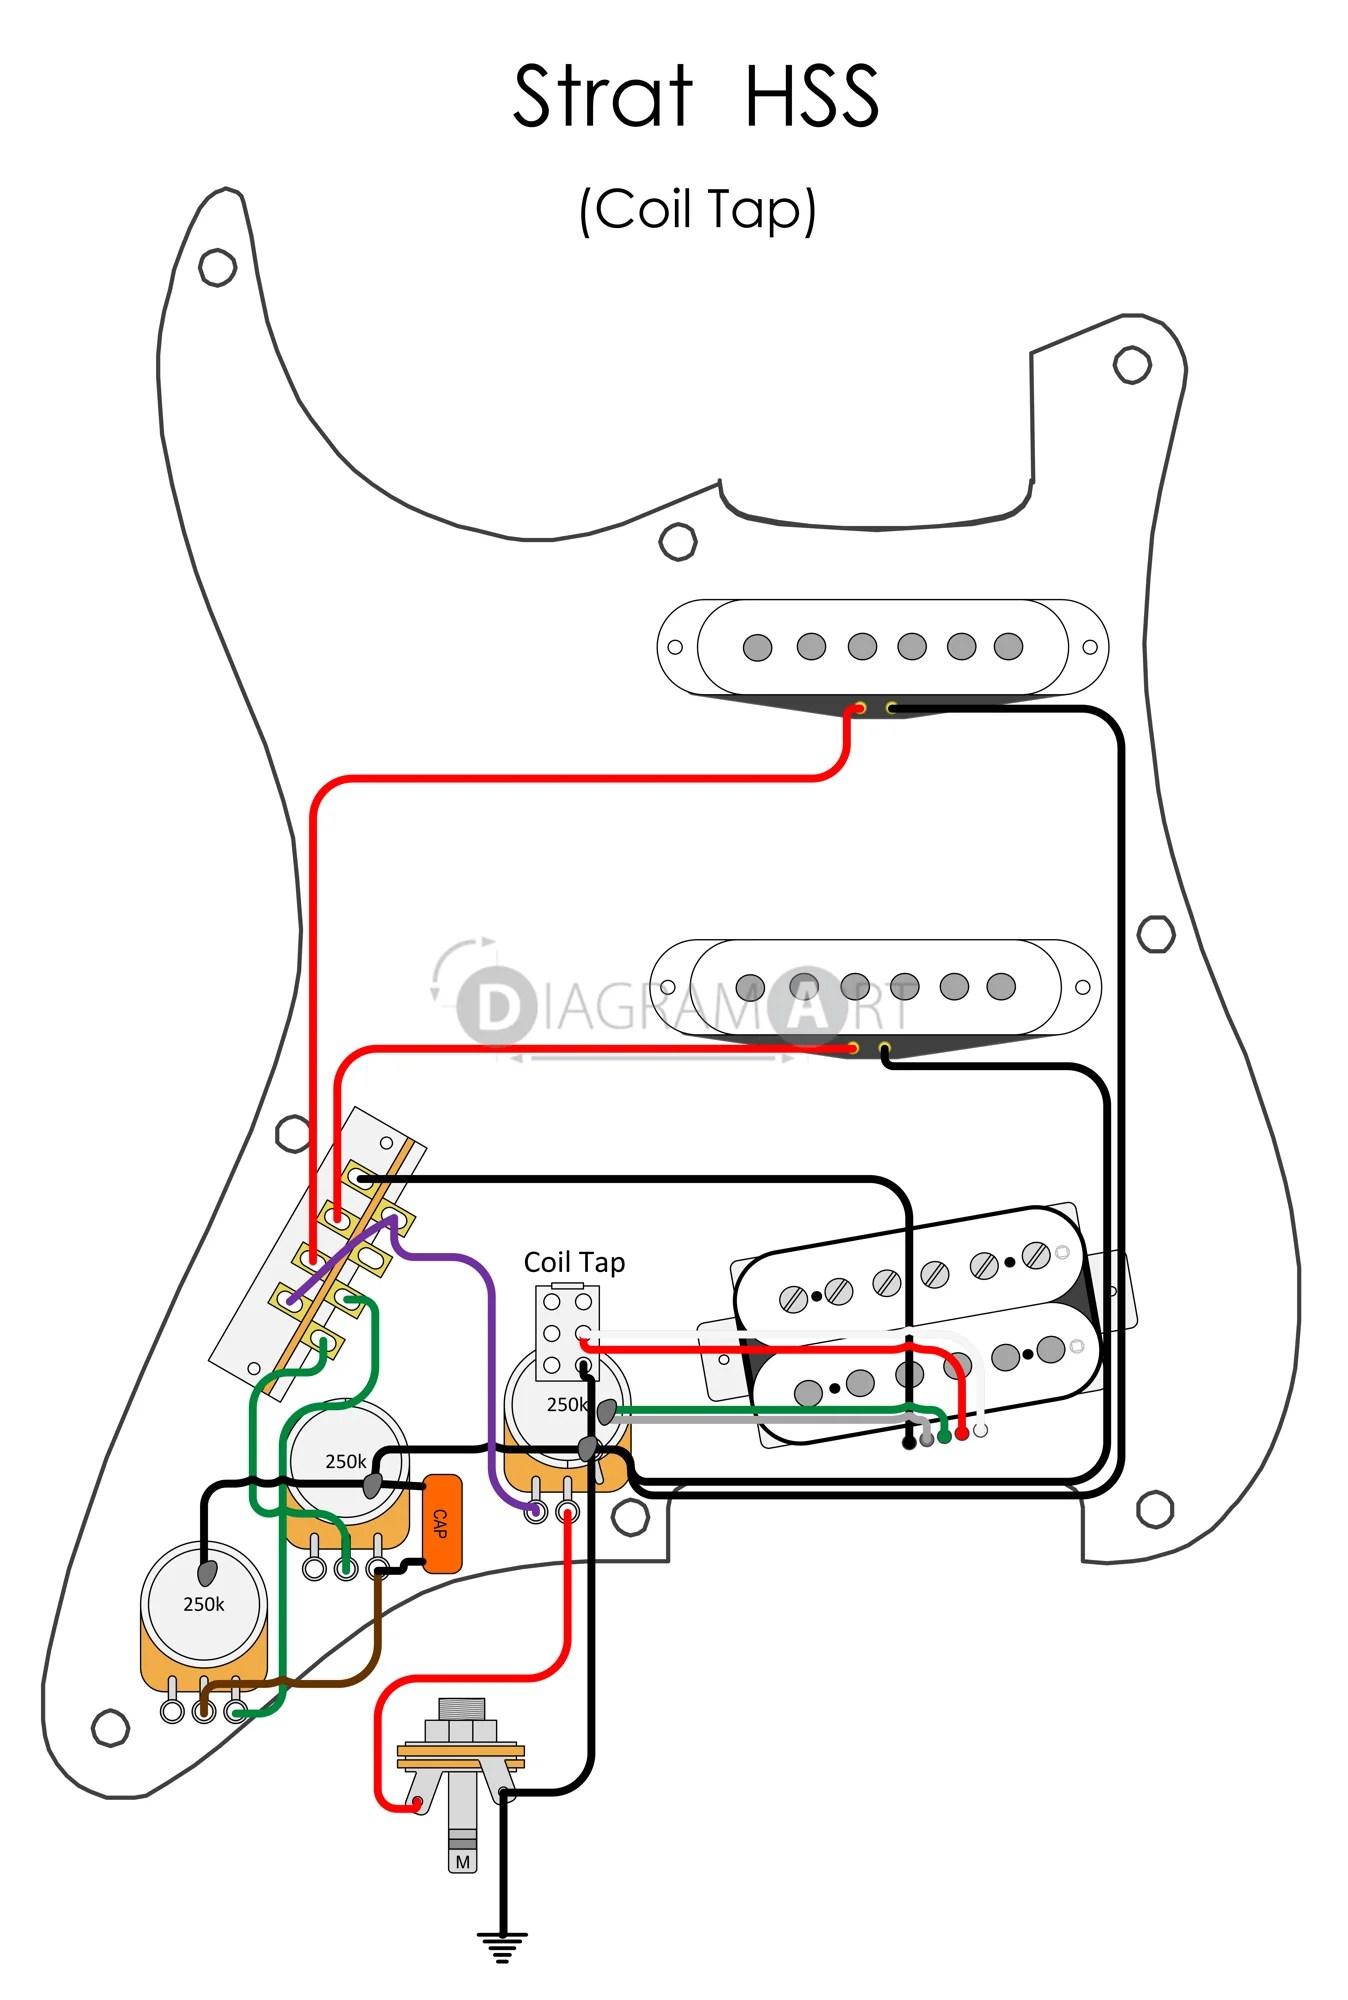 dimarzio hss wiring diagram wiring diagram forward dimarzio single coil wiring diagram [ 1348 x 2000 Pixel ]